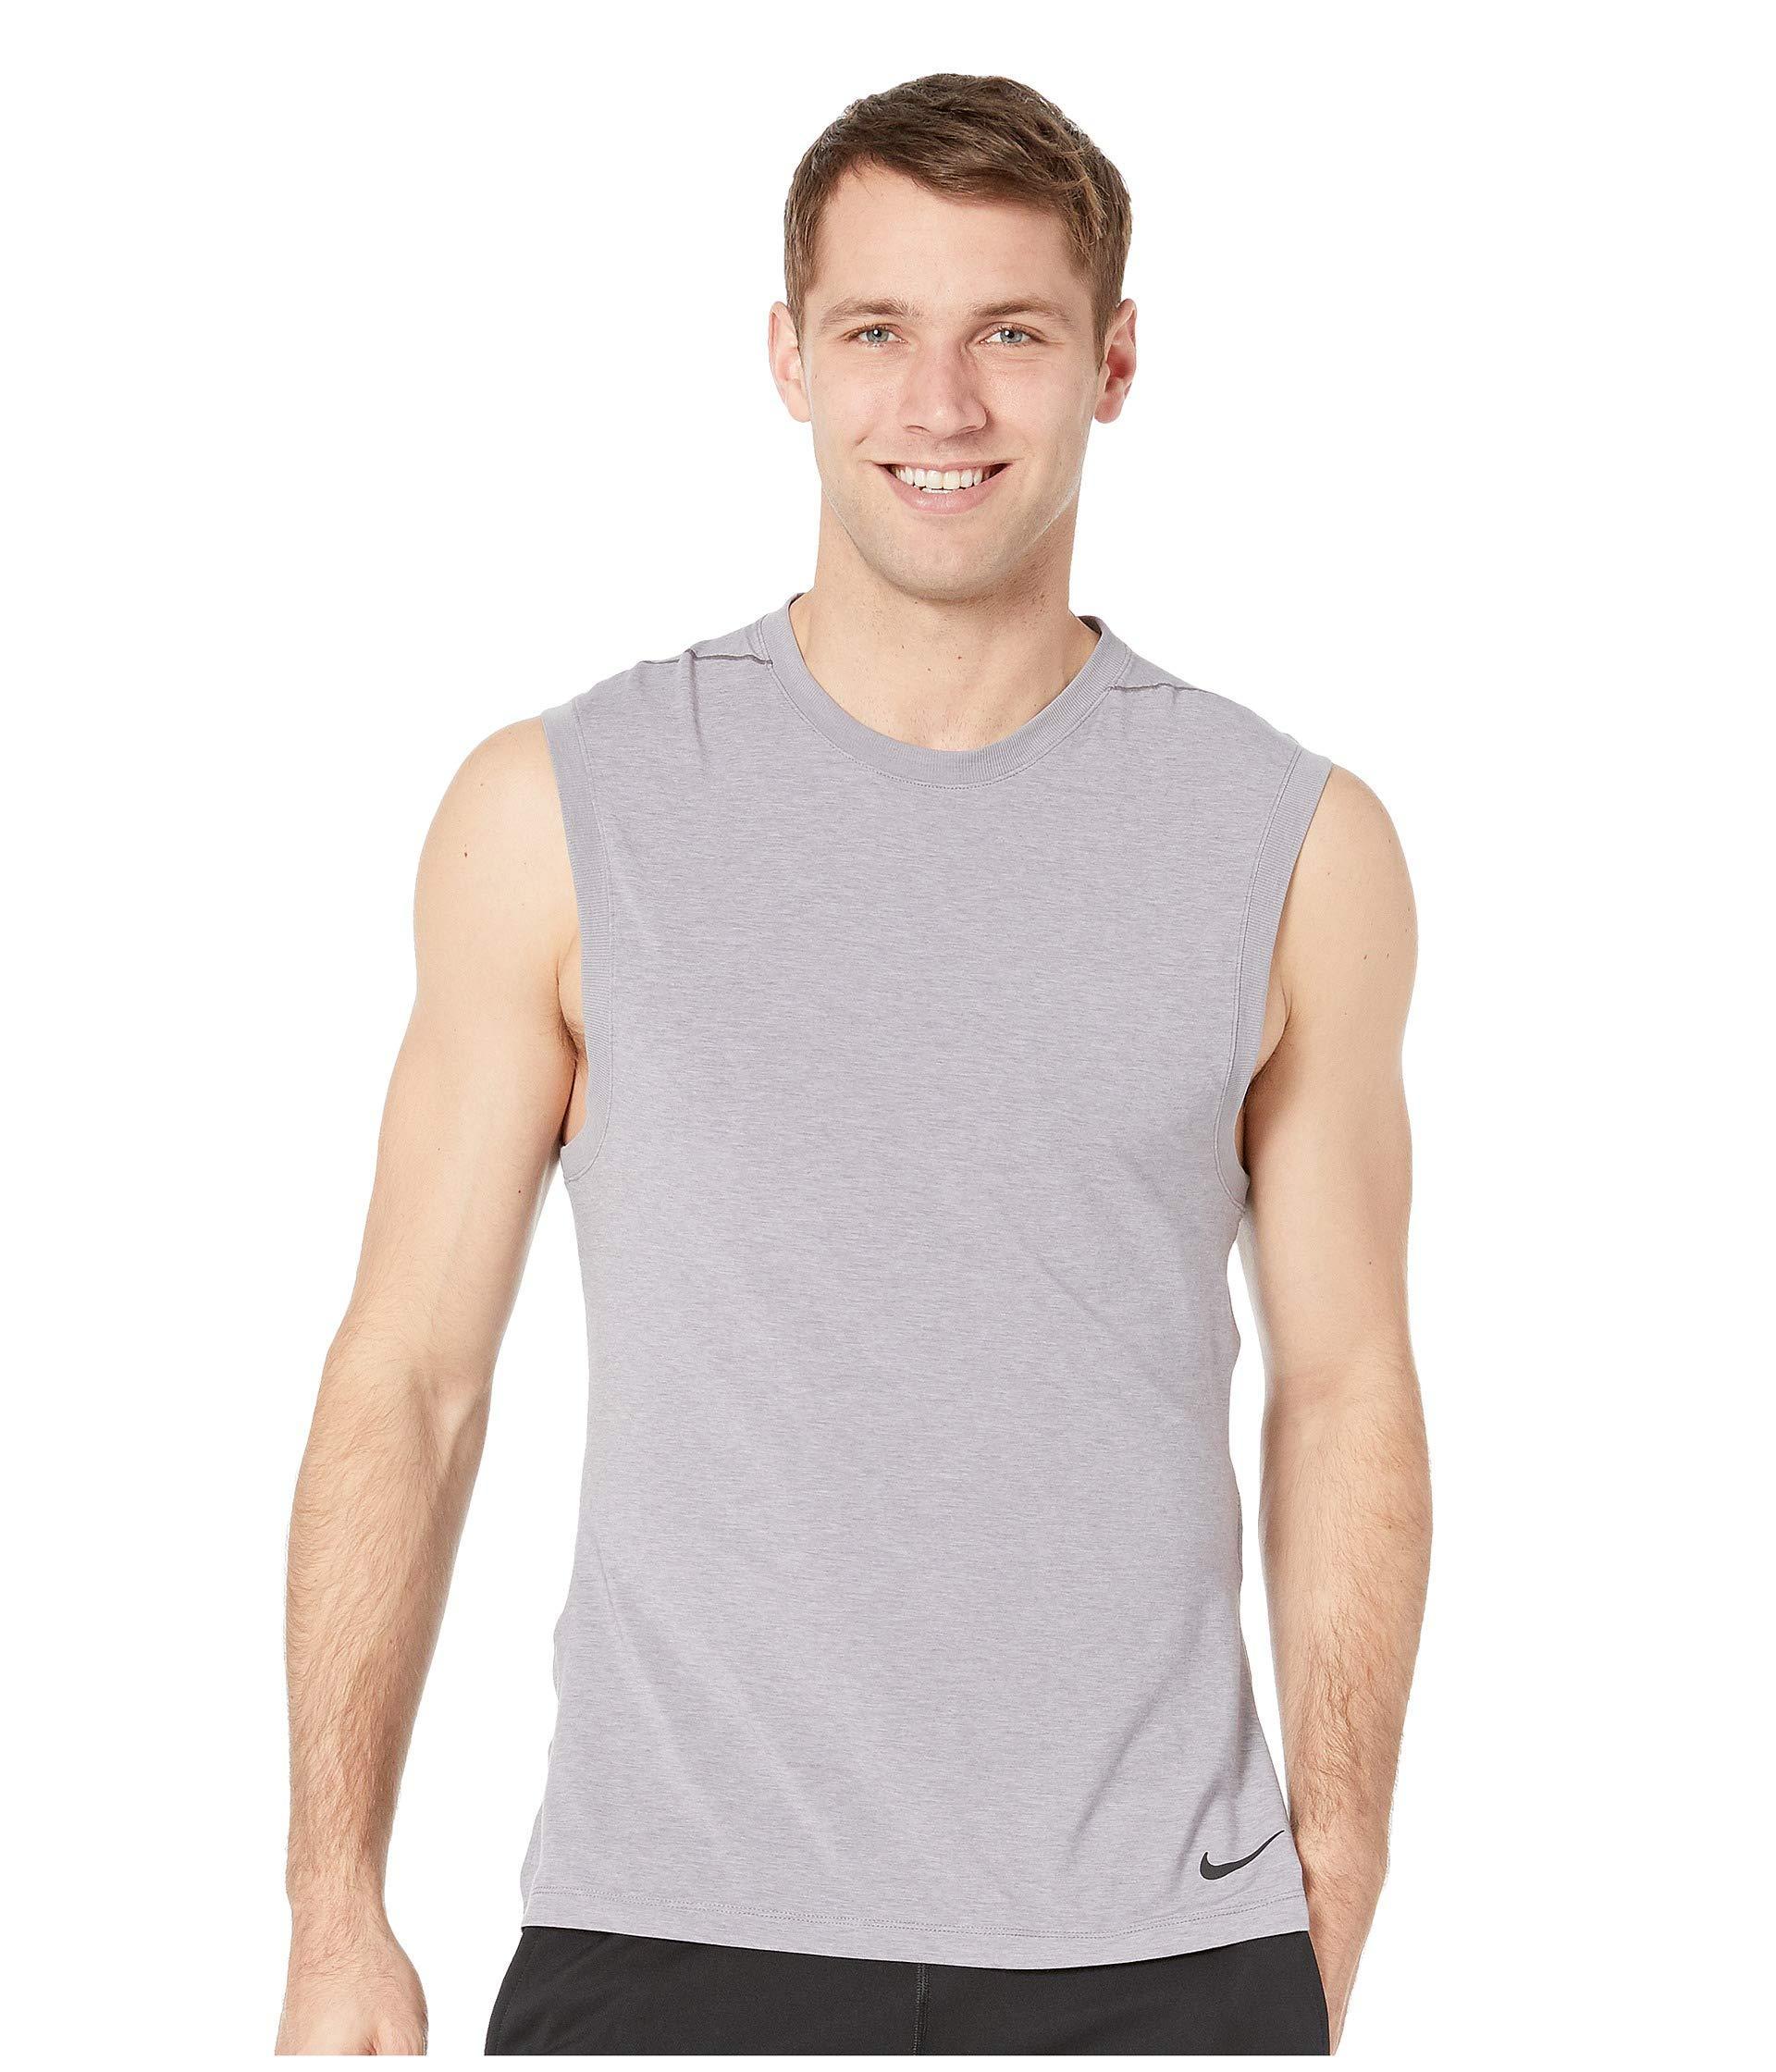 69be7a63c14d6 Nike. Gray Dry Tank Transcend (indigo Fog light Armory Blue black) Men s  Sleeveless